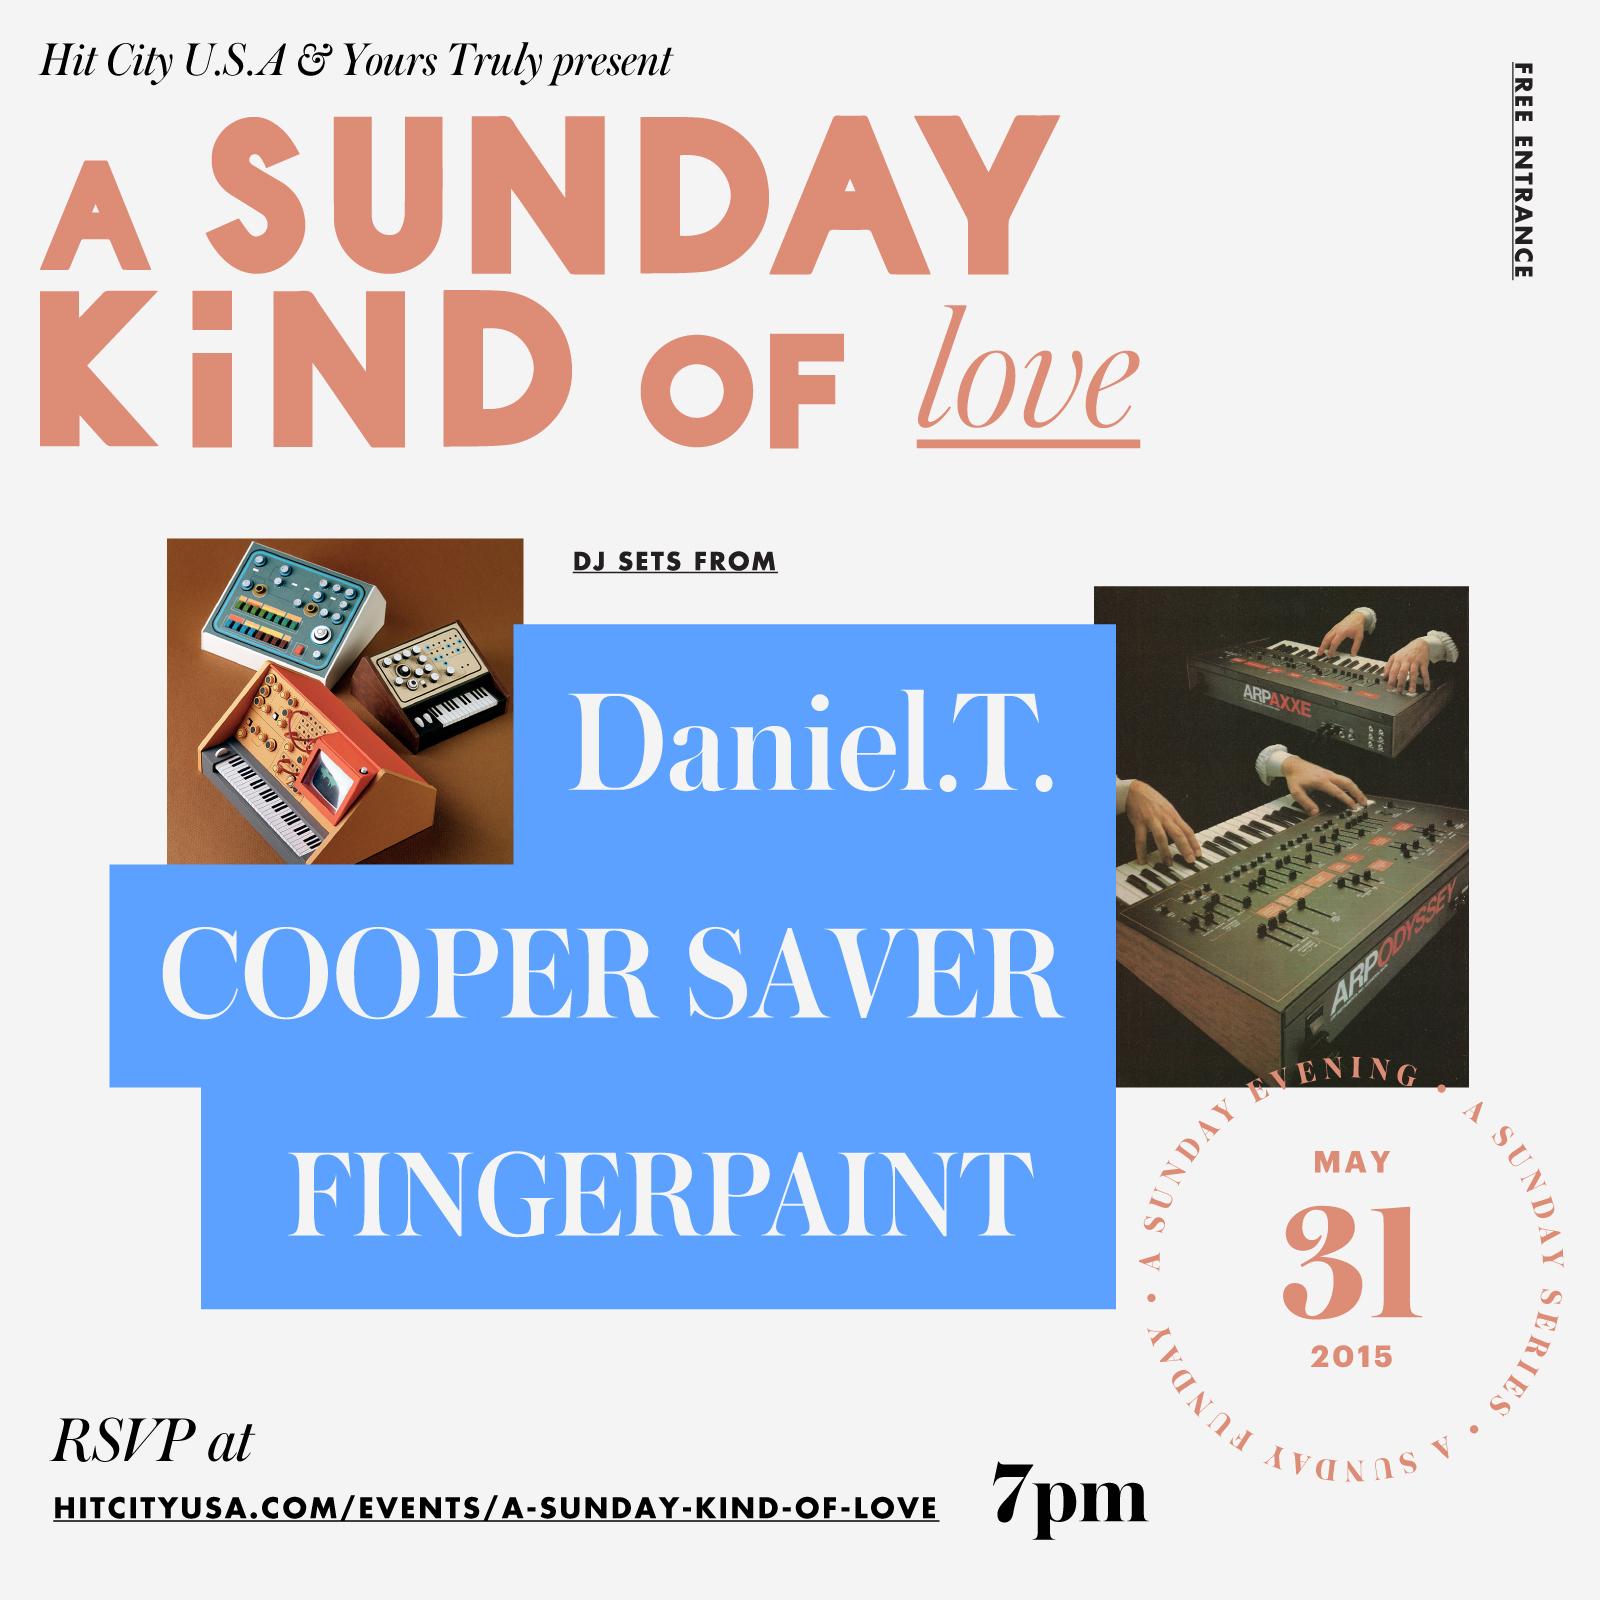 A Sunday Kind of Love w/ Daniel.T., Cooper Saver, & Fingerpaint